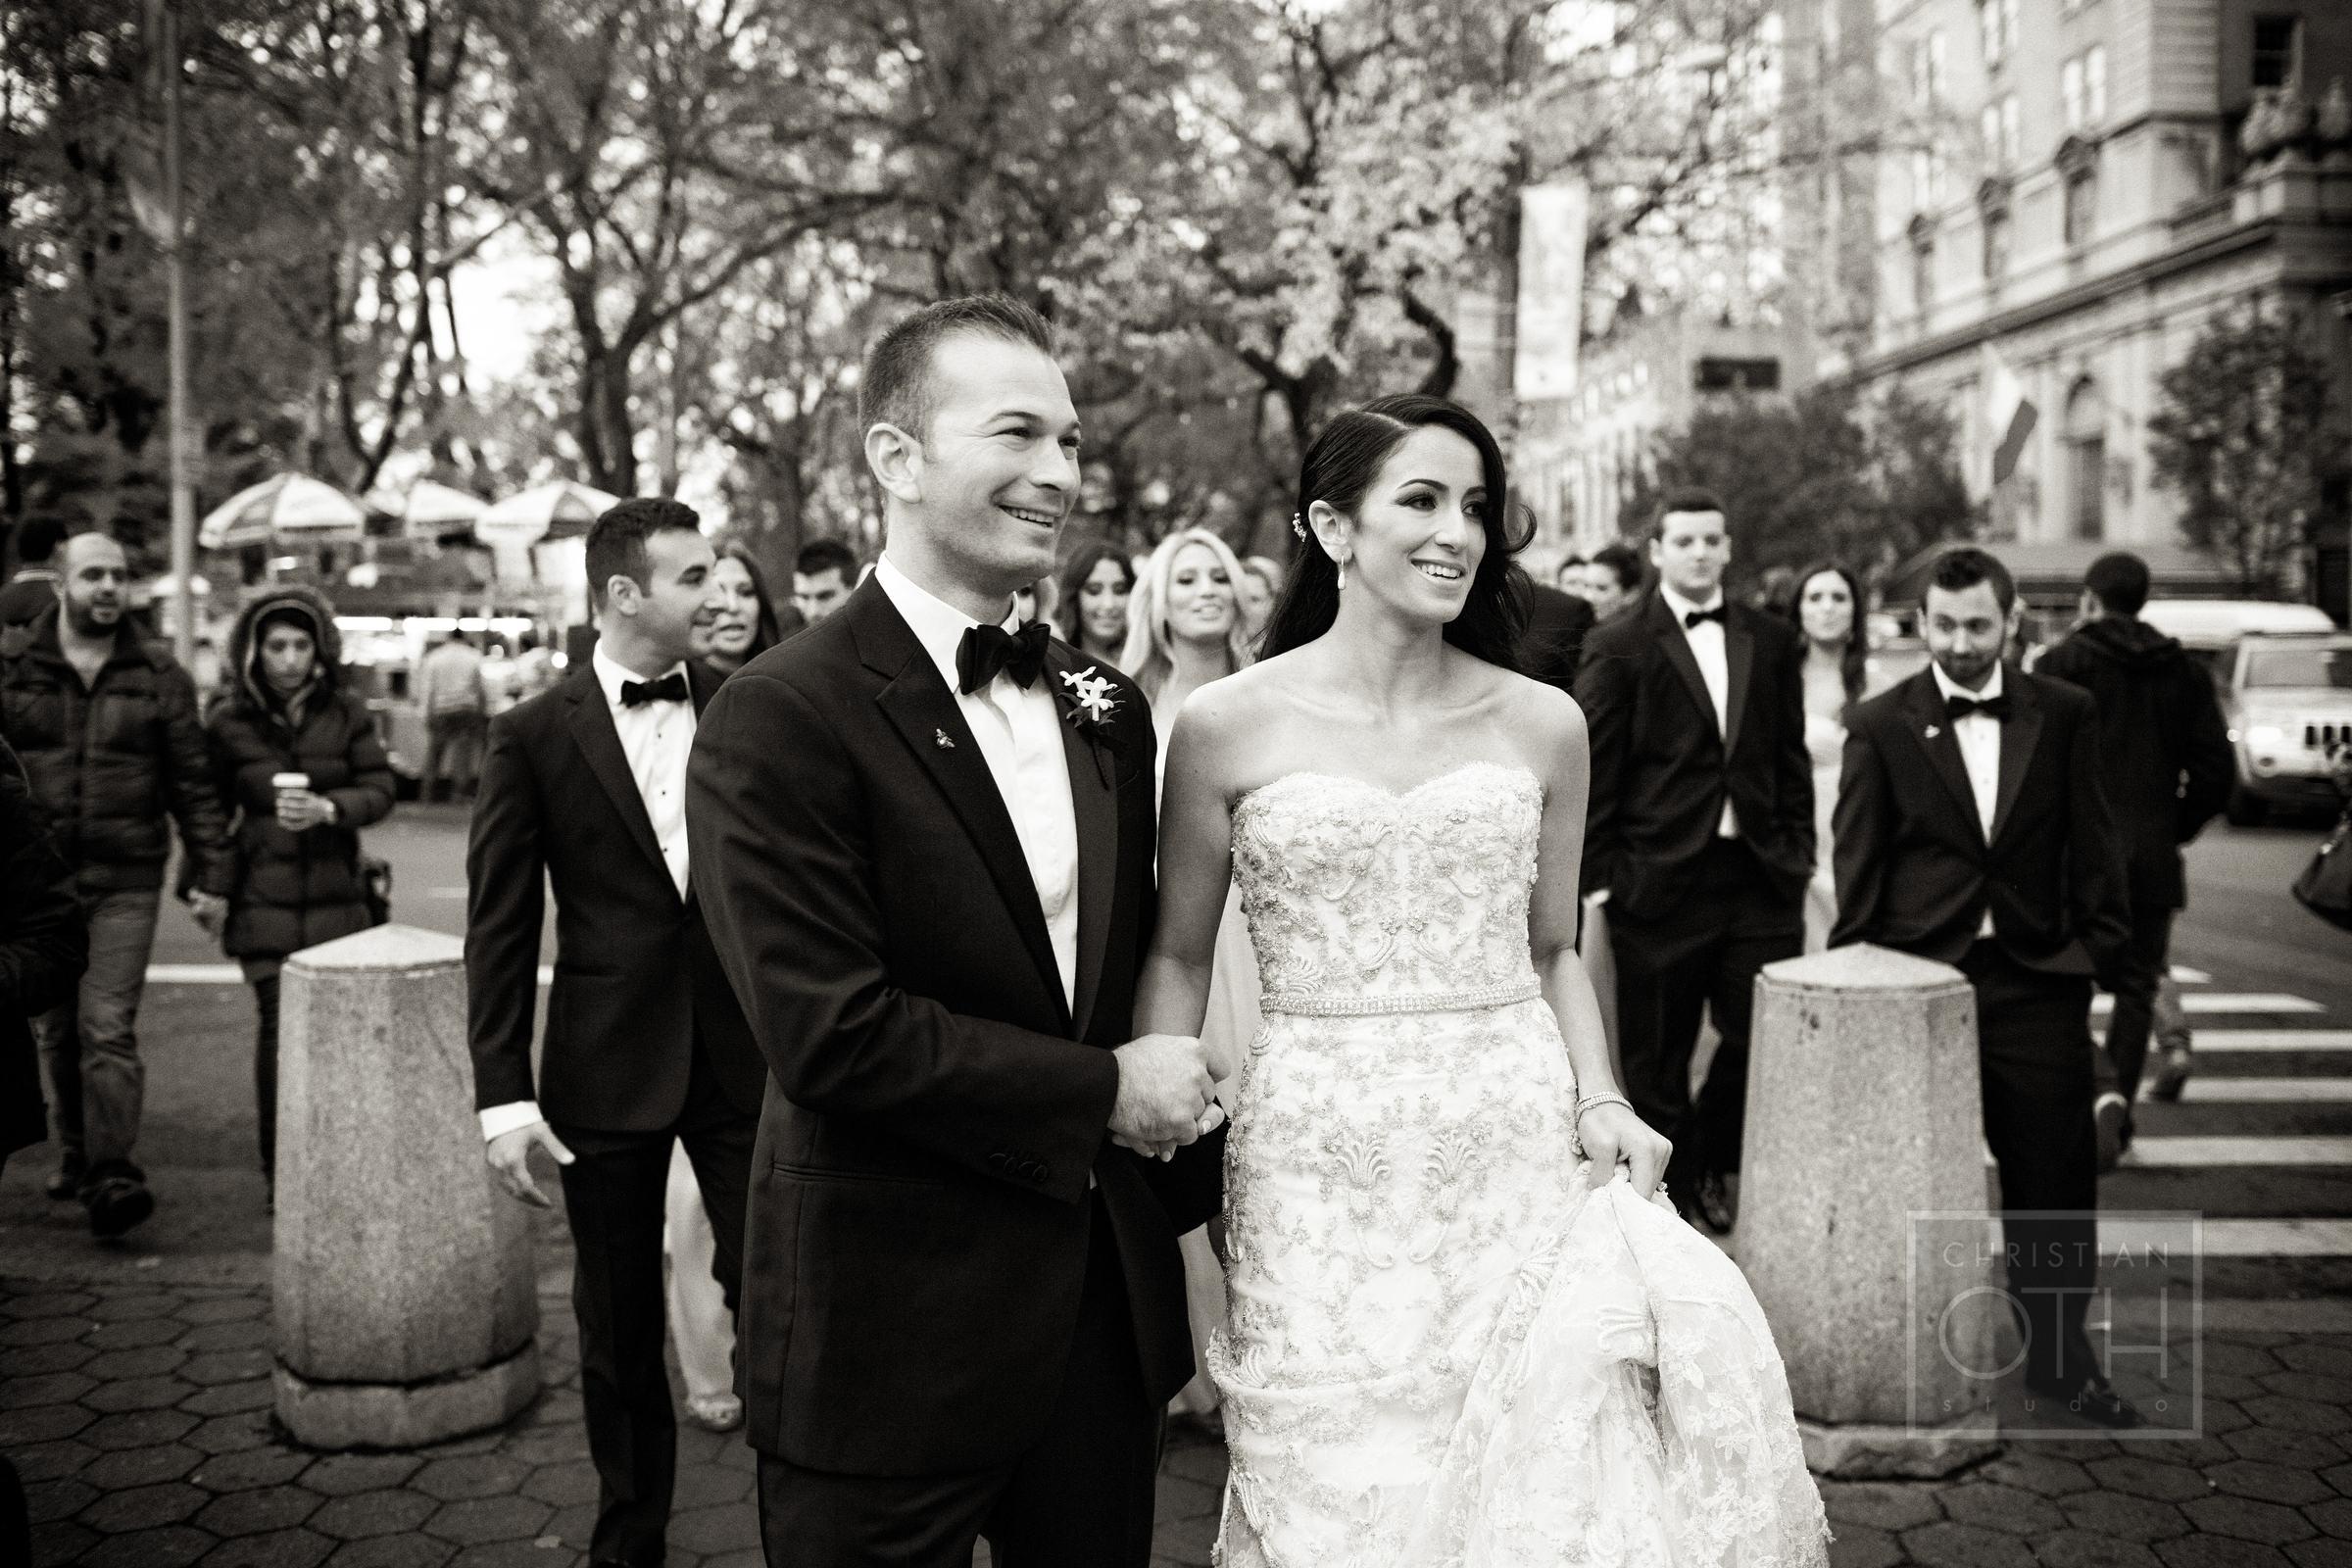 Ceci_New_York_Custom_Invitation_Pierre__City_ Destination_Wedding_Luxury_Personalized_Ceci_Style_Bride_Rose_Gold_Foil_Stamping67.JPG